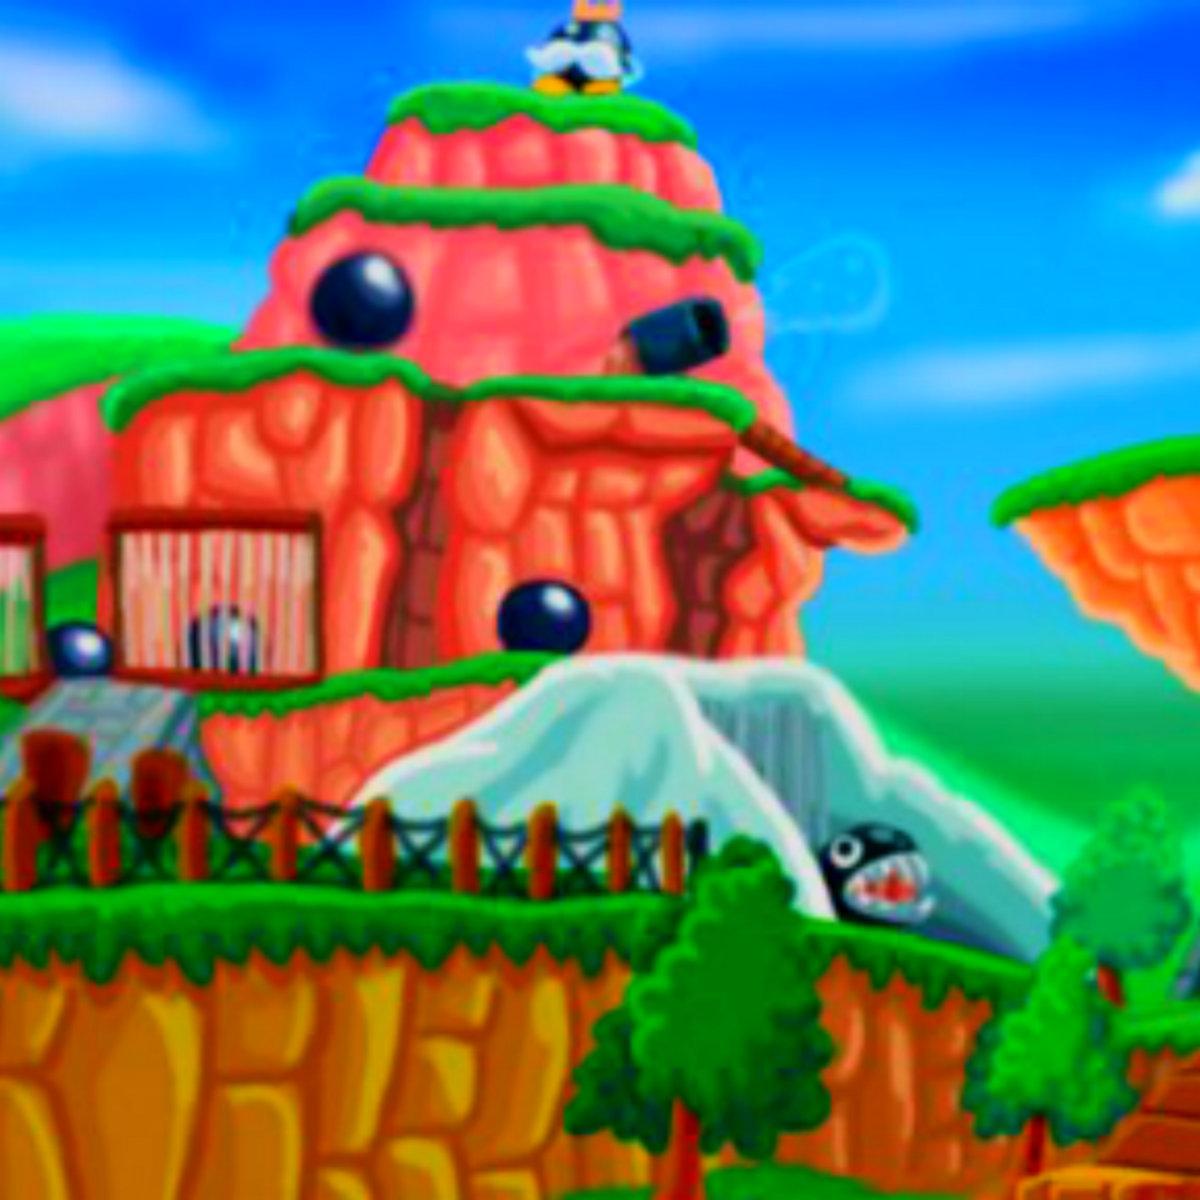 Bob-Omb Battlefield - Super Mario 64 (BW Soundfont Remix